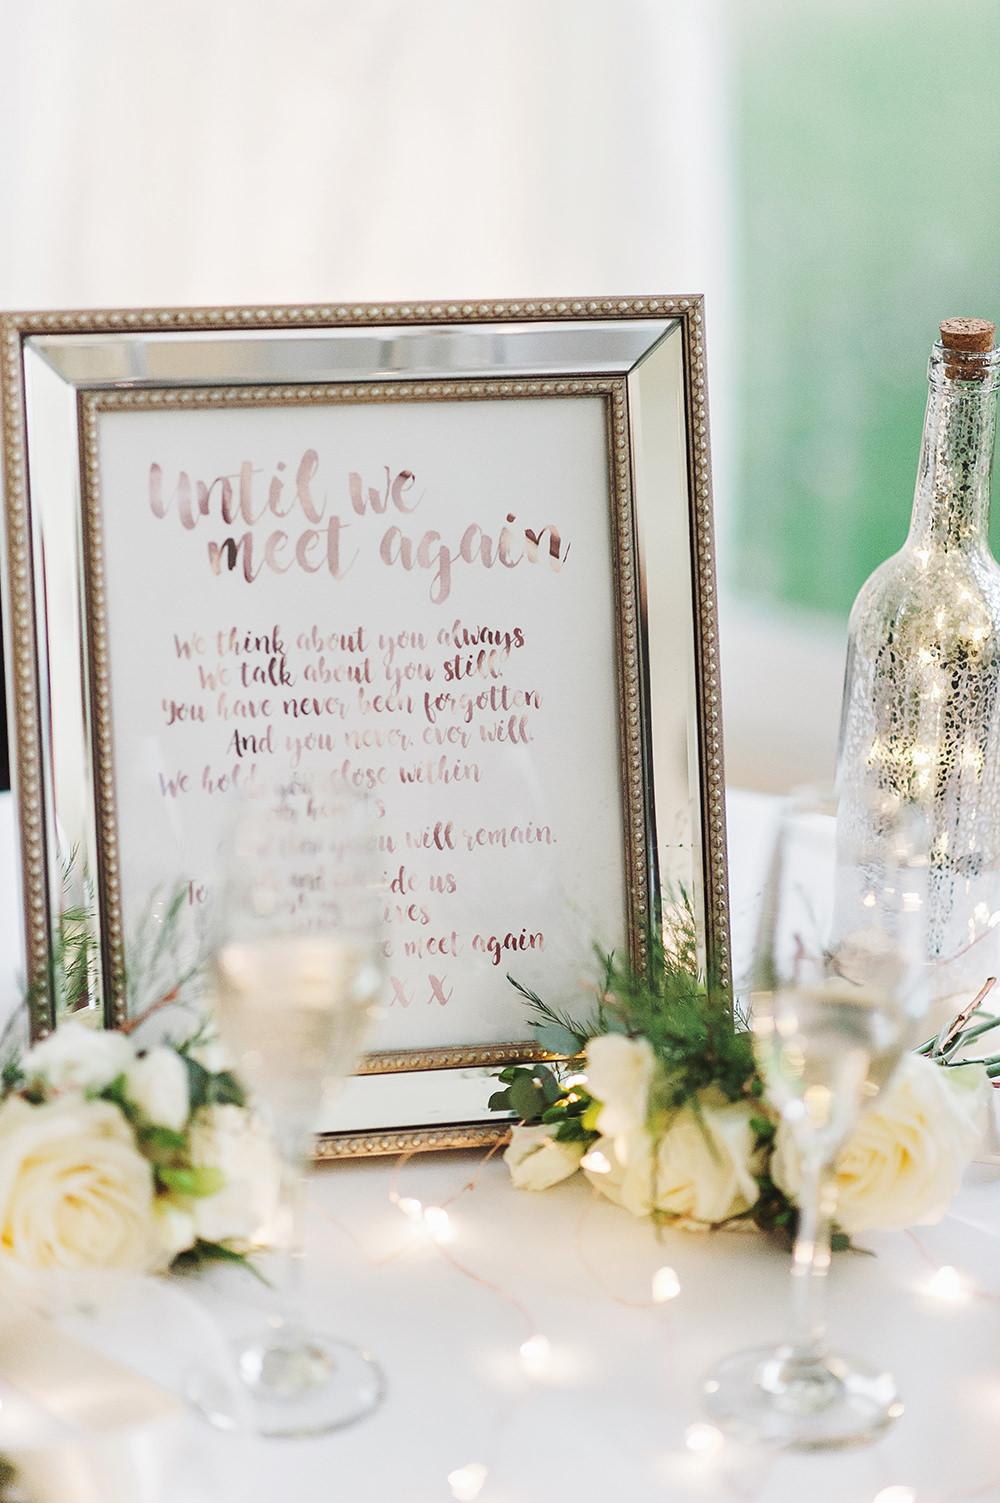 Memory Table Until We Meet Again Frame Edmondsham House Wedding Darima Frampton Photography